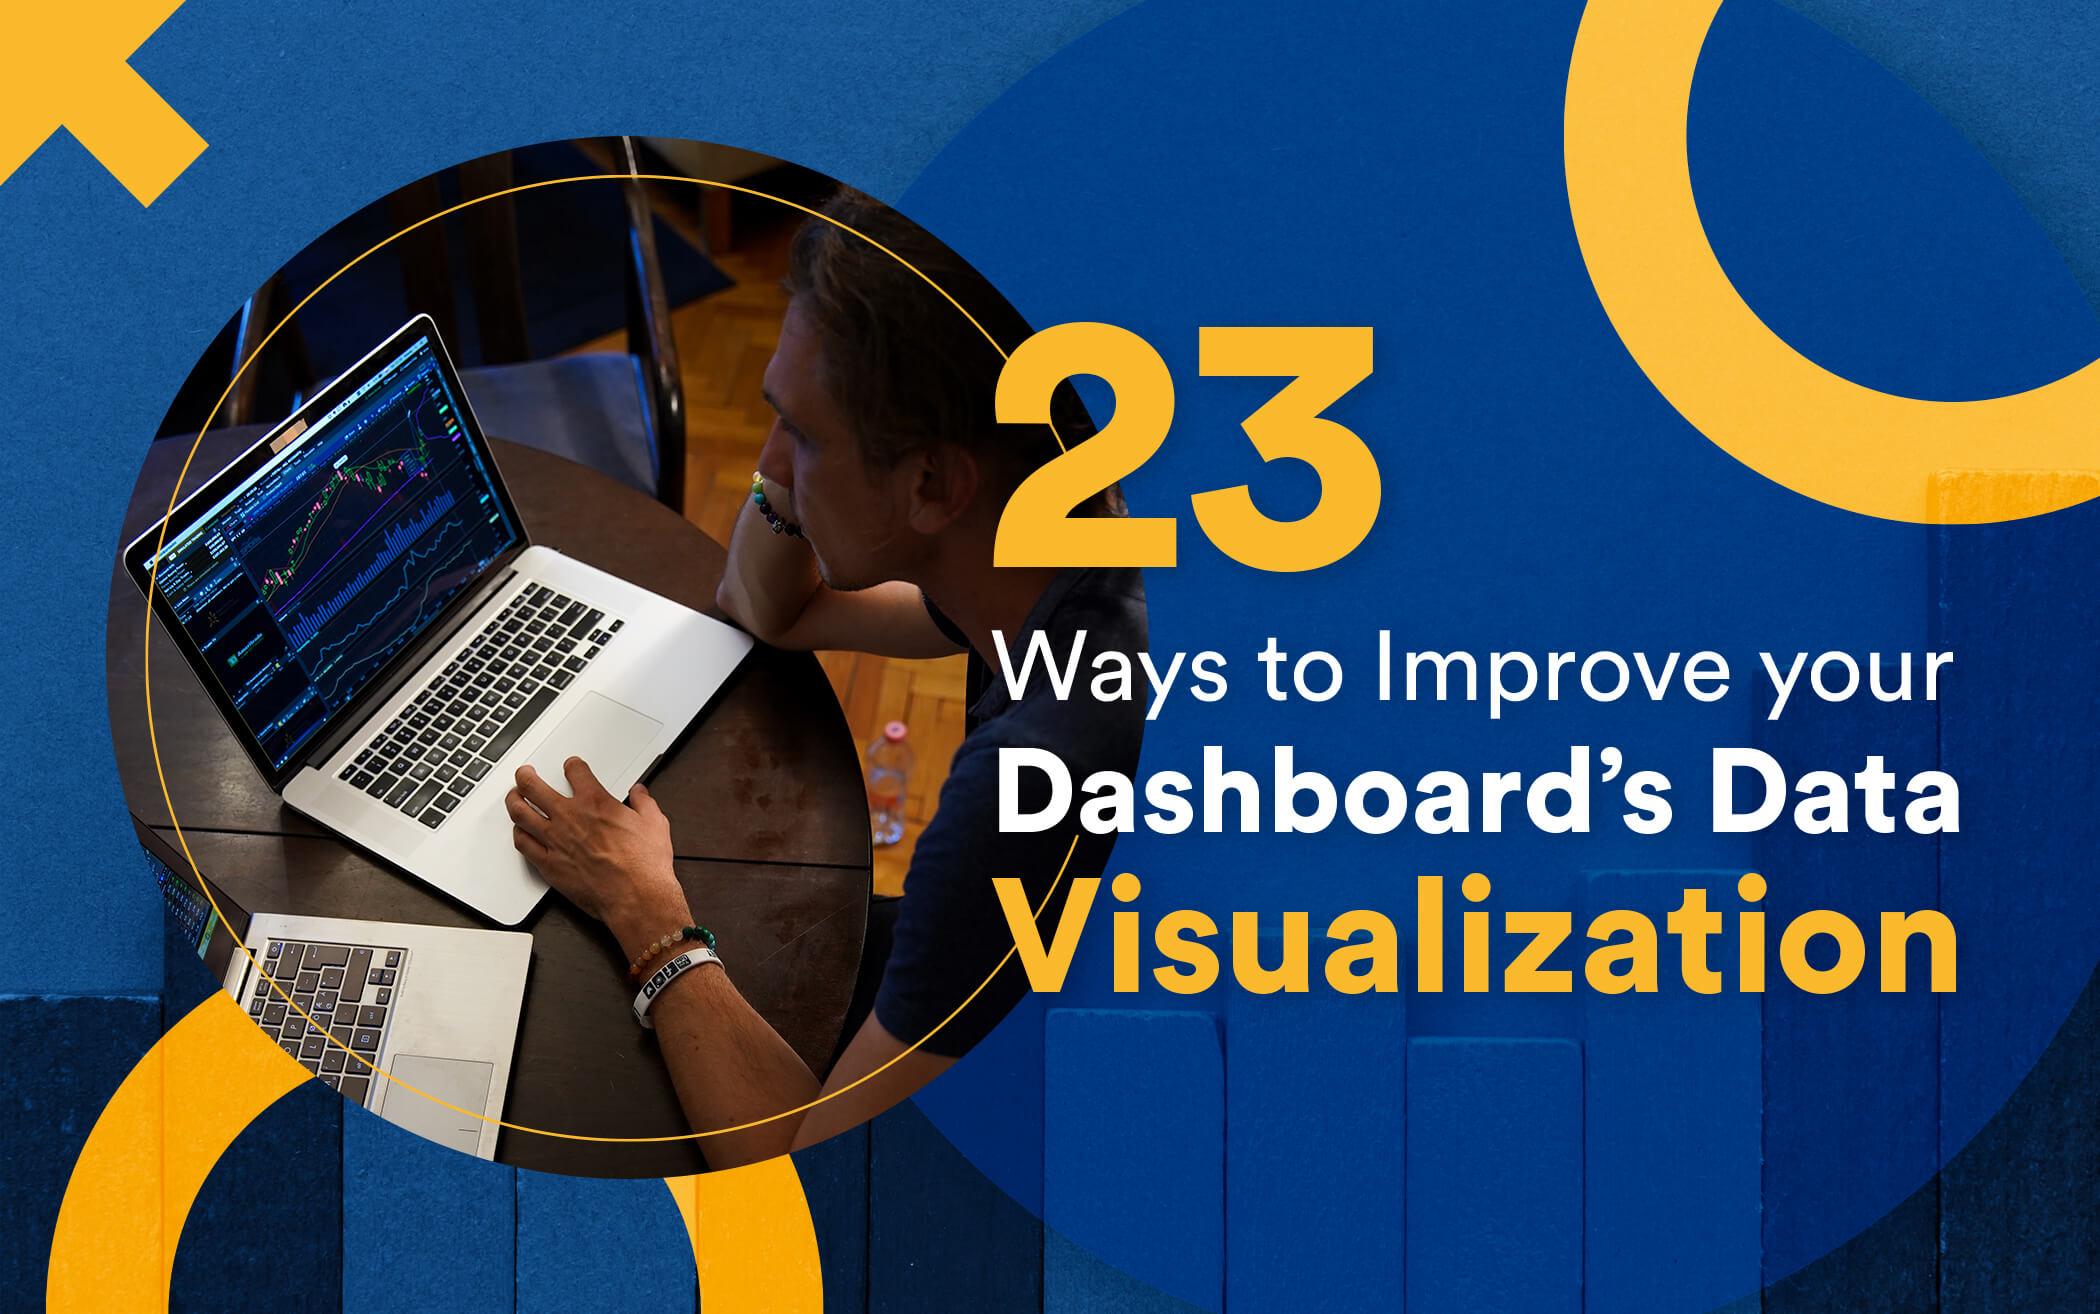 23 Ways to Improve your Dashboard's Data Visualization